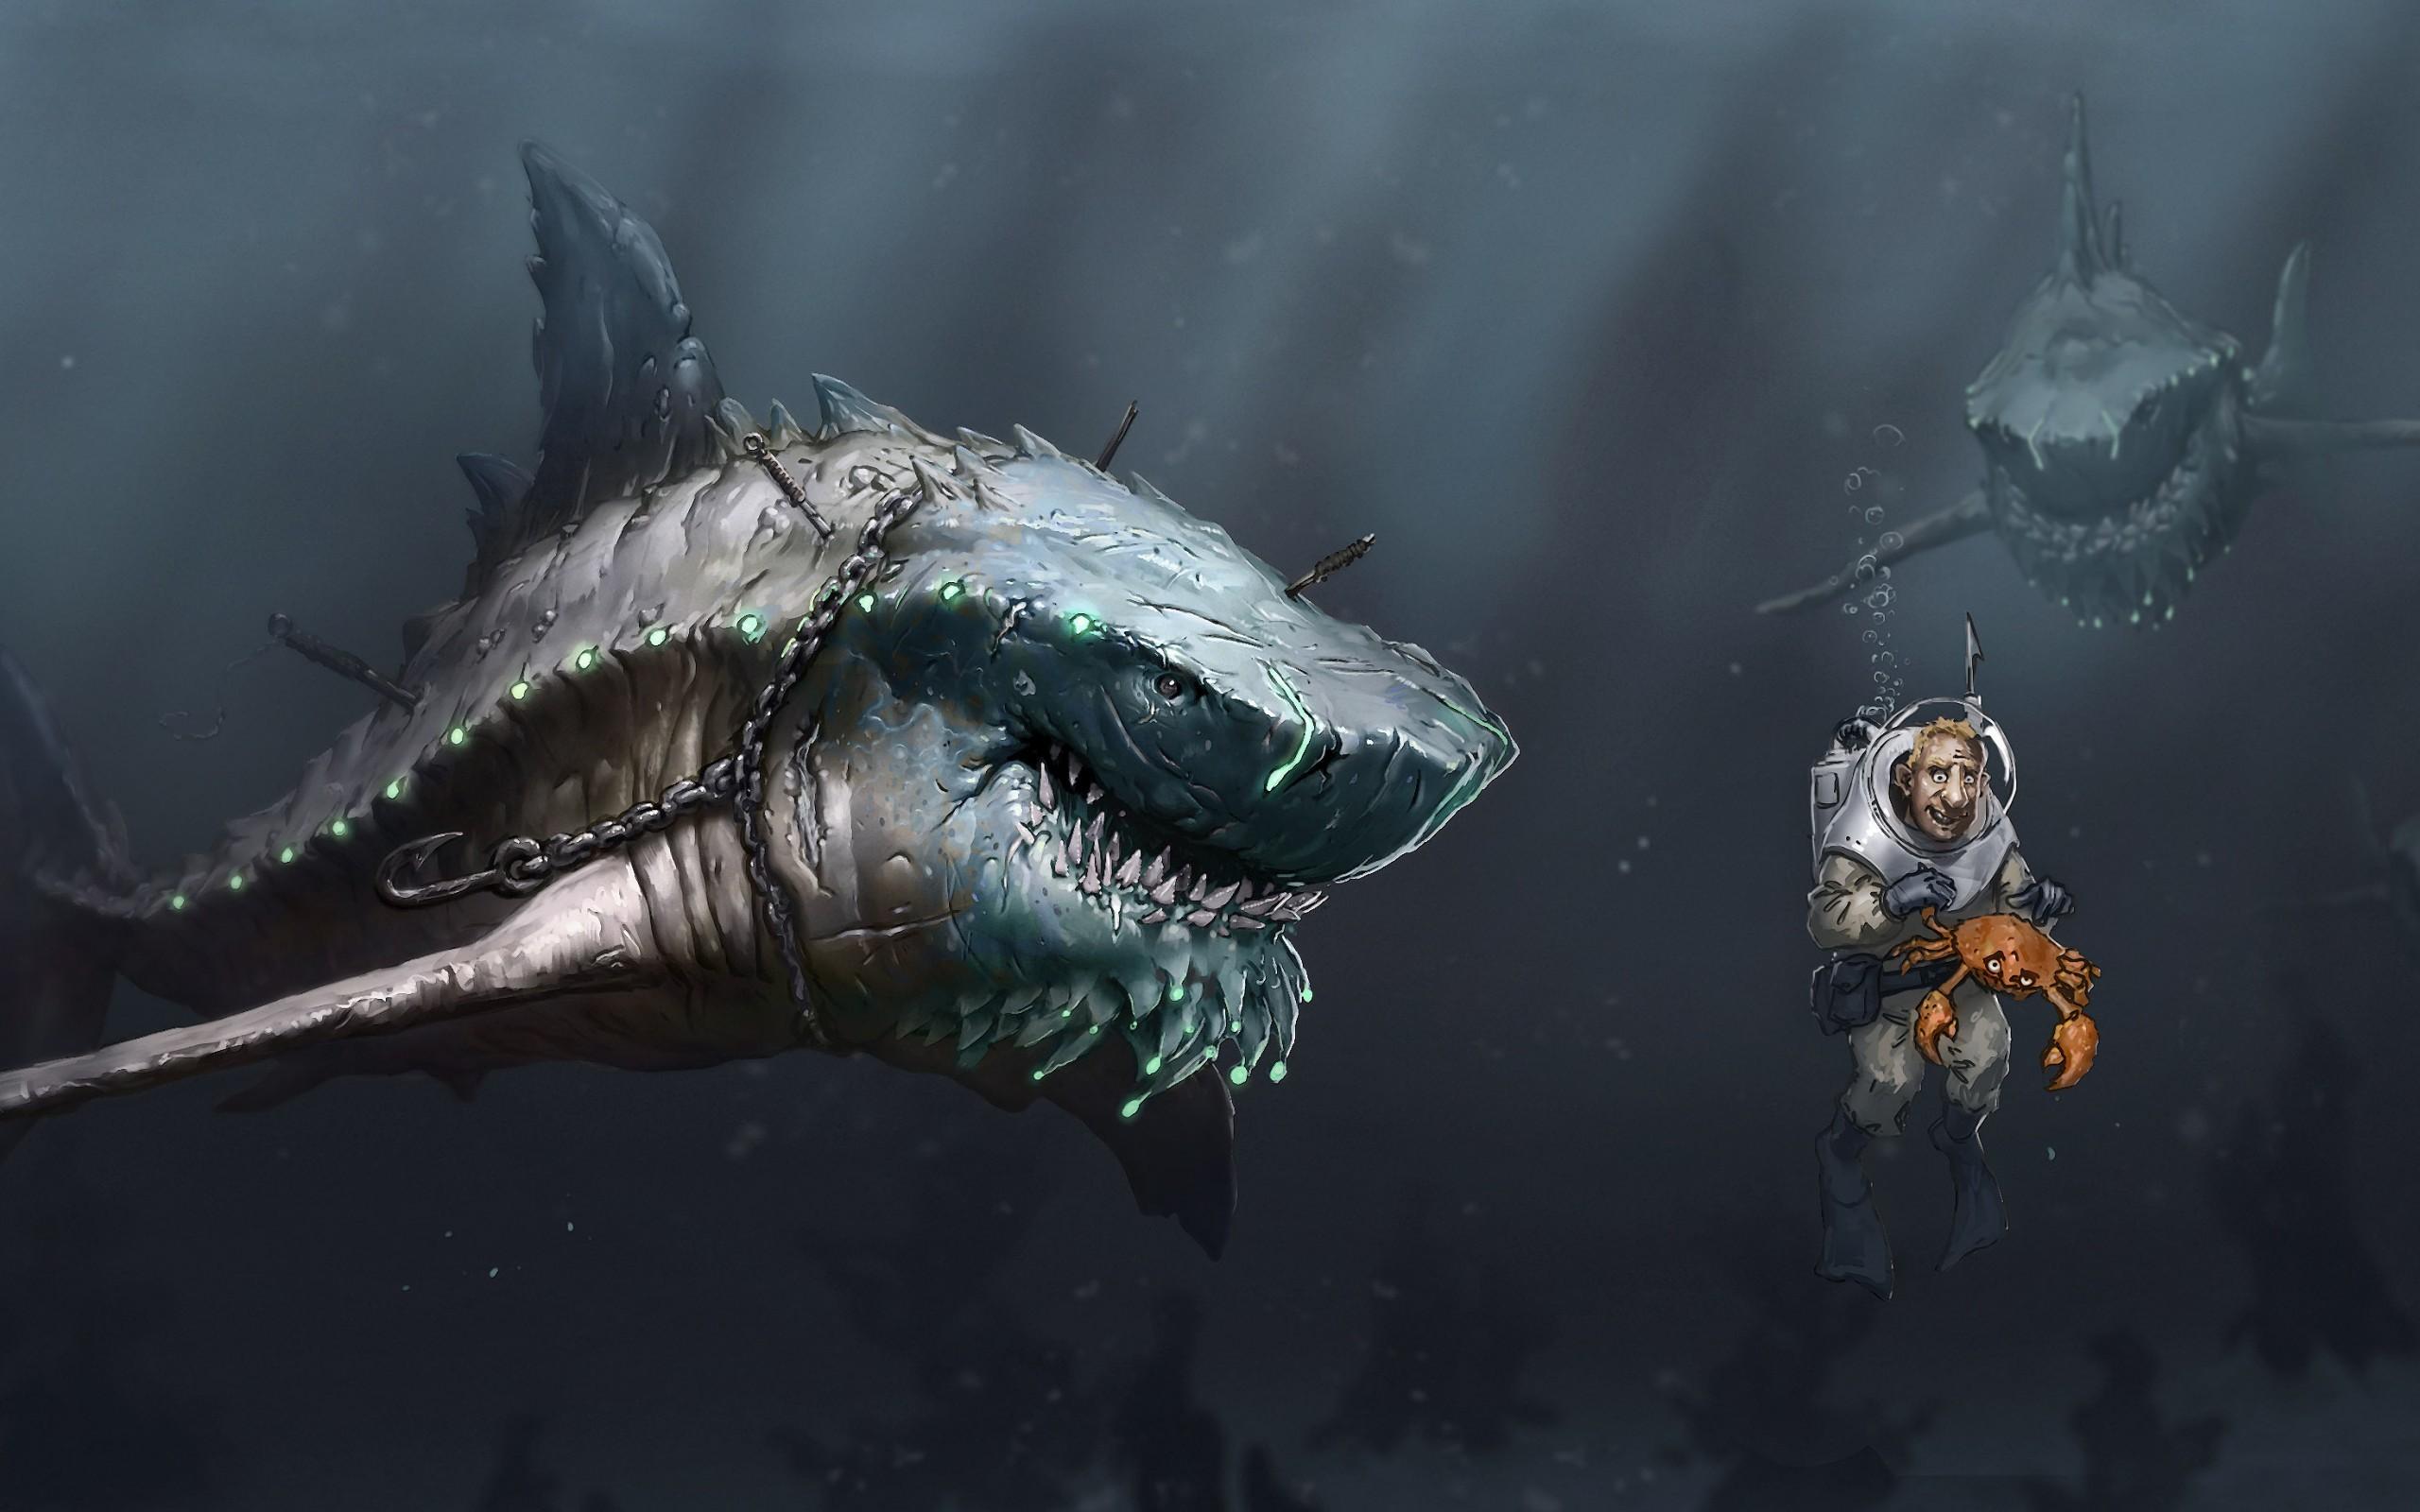 Art sea underwater sharks Megalodon predators starvation people scuba crab  chain hook sci-fi dark